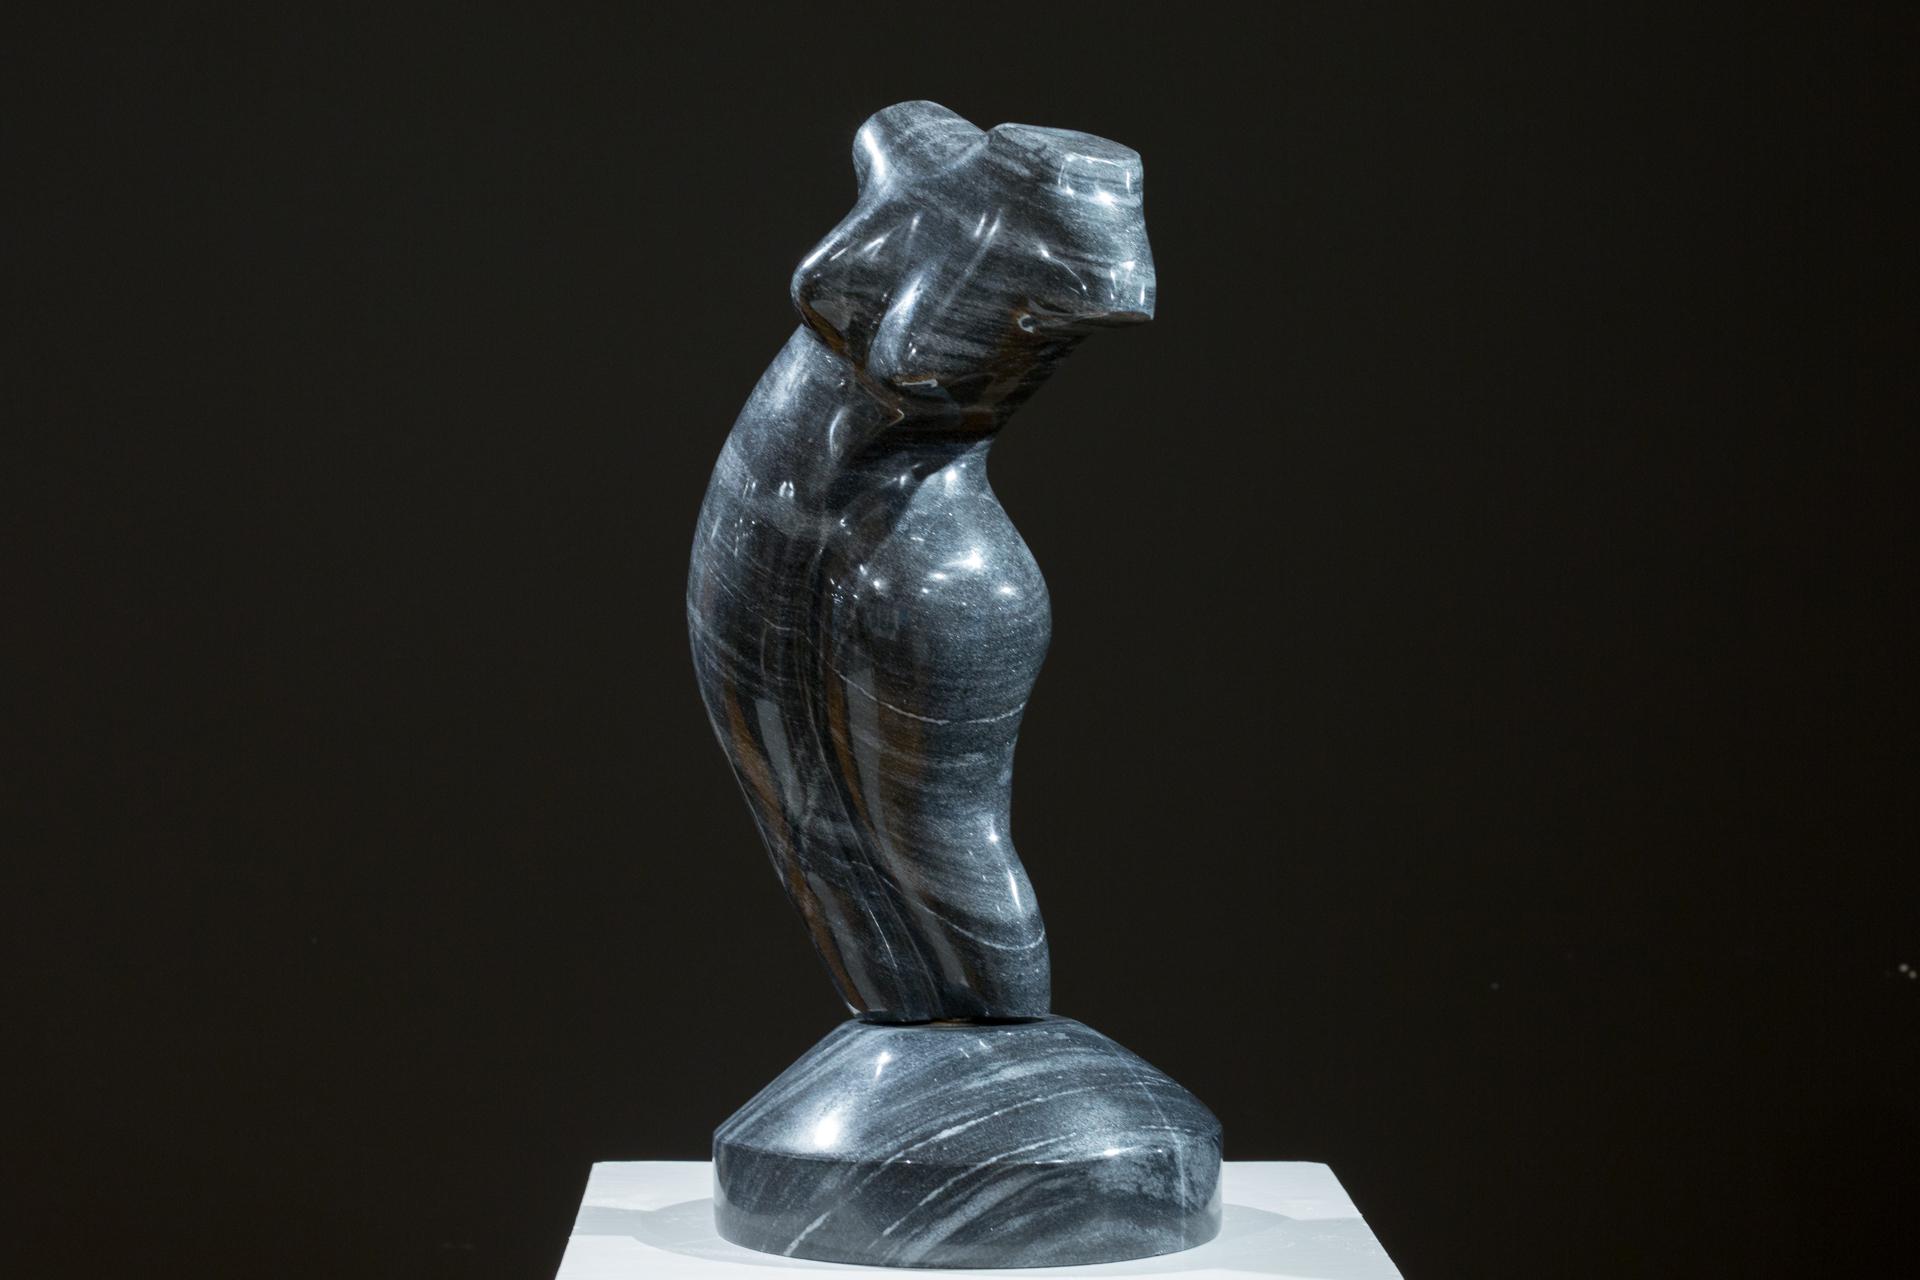 Torso by Gert Olsen